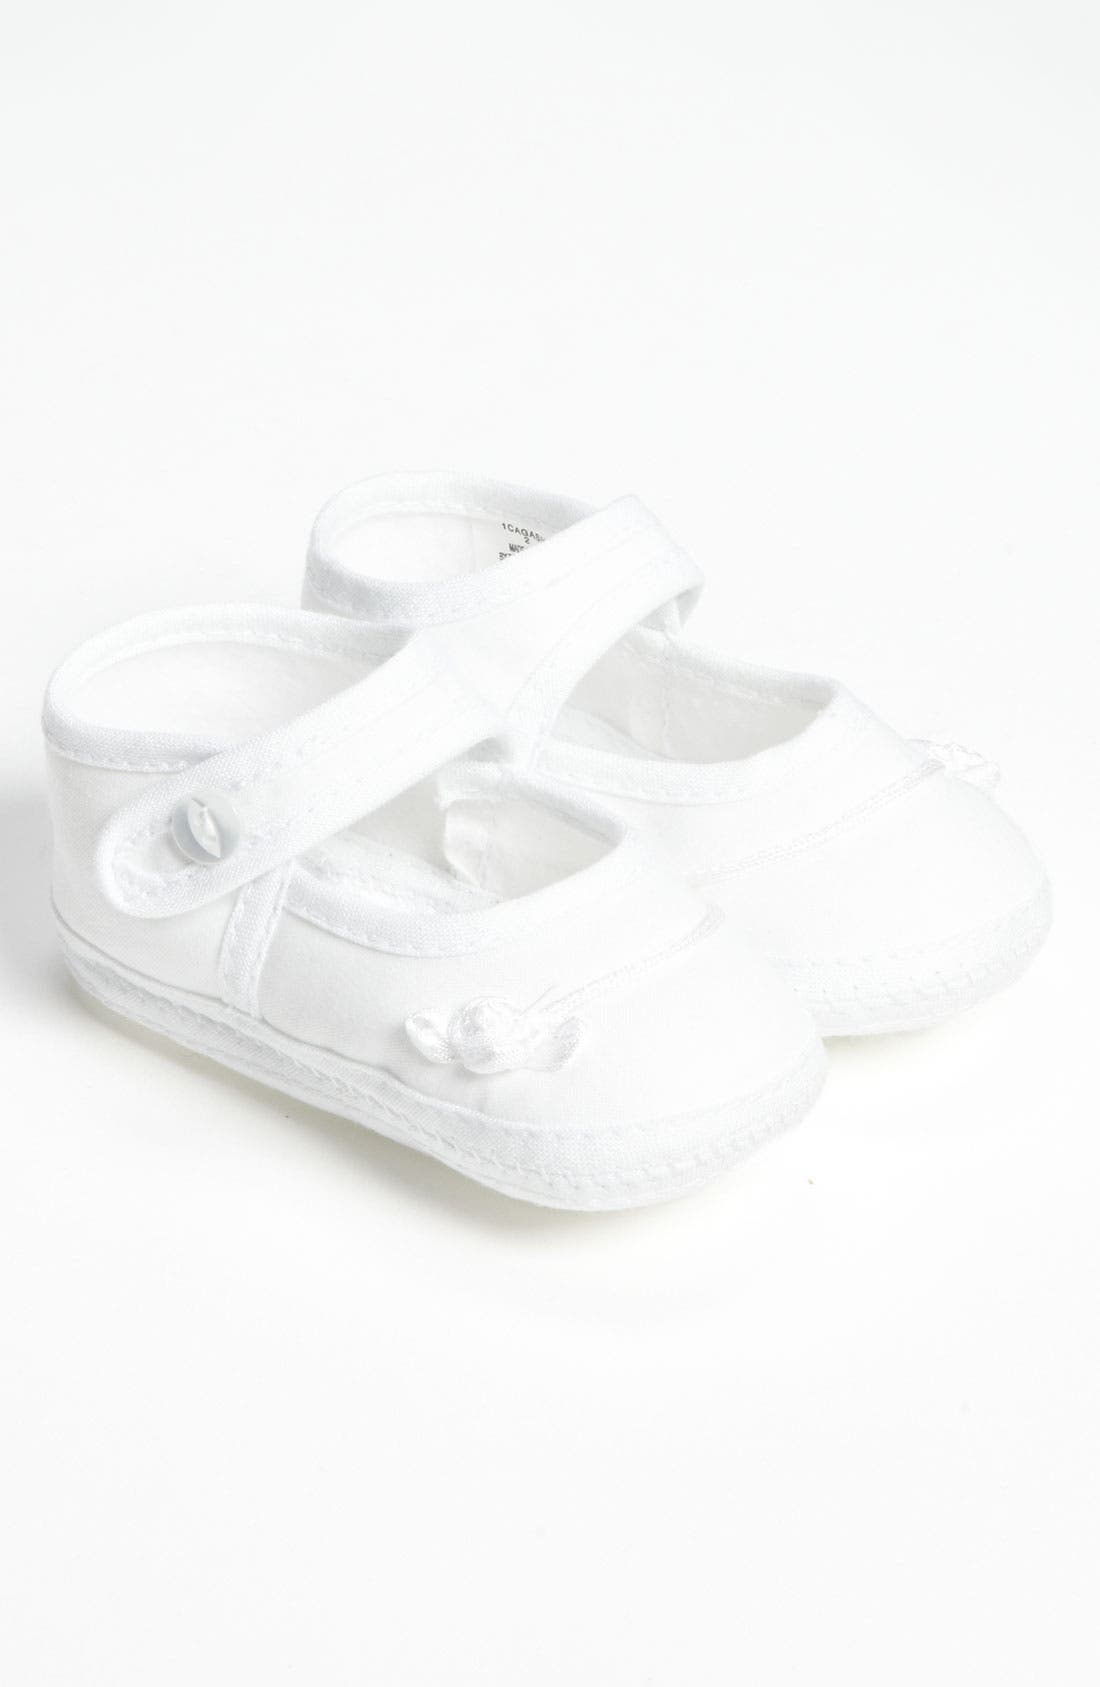 Main Image - Little Things Mean a Lot Cotton Batiste Shoe (Baby)